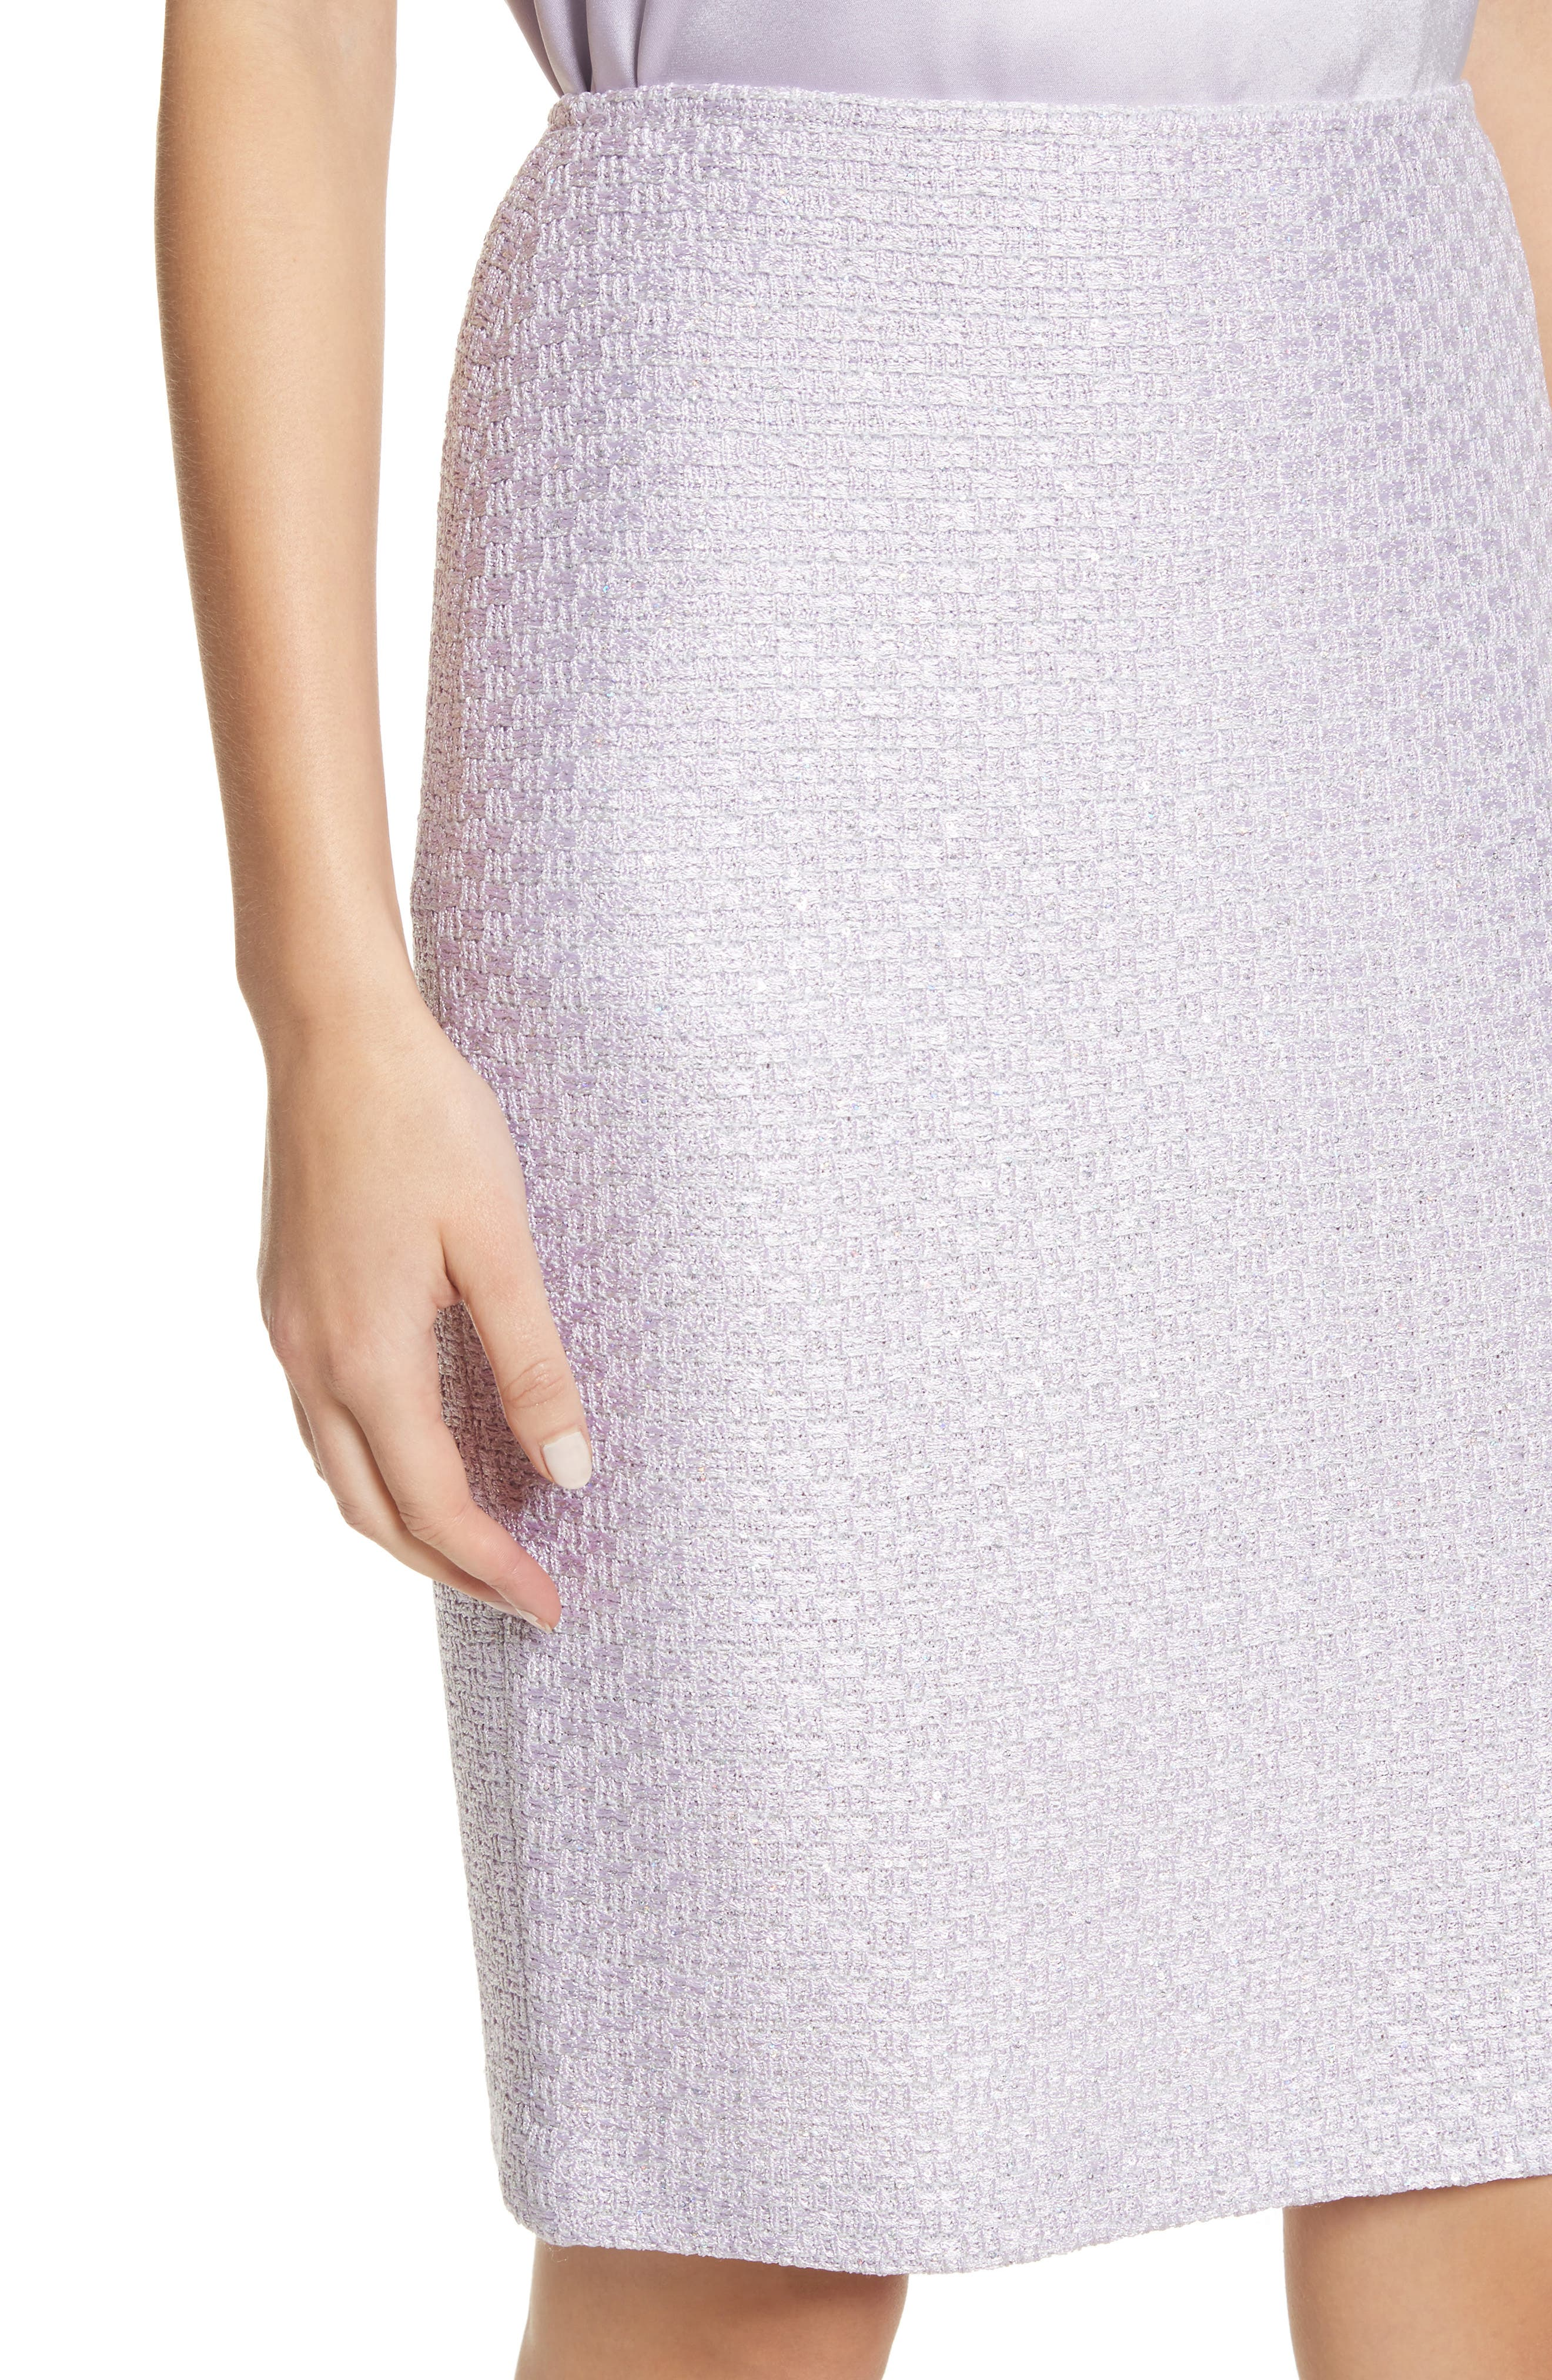 Hansh Sequin Knit Pencil Skirt,                             Alternate thumbnail 4, color,                             Lilac Multi